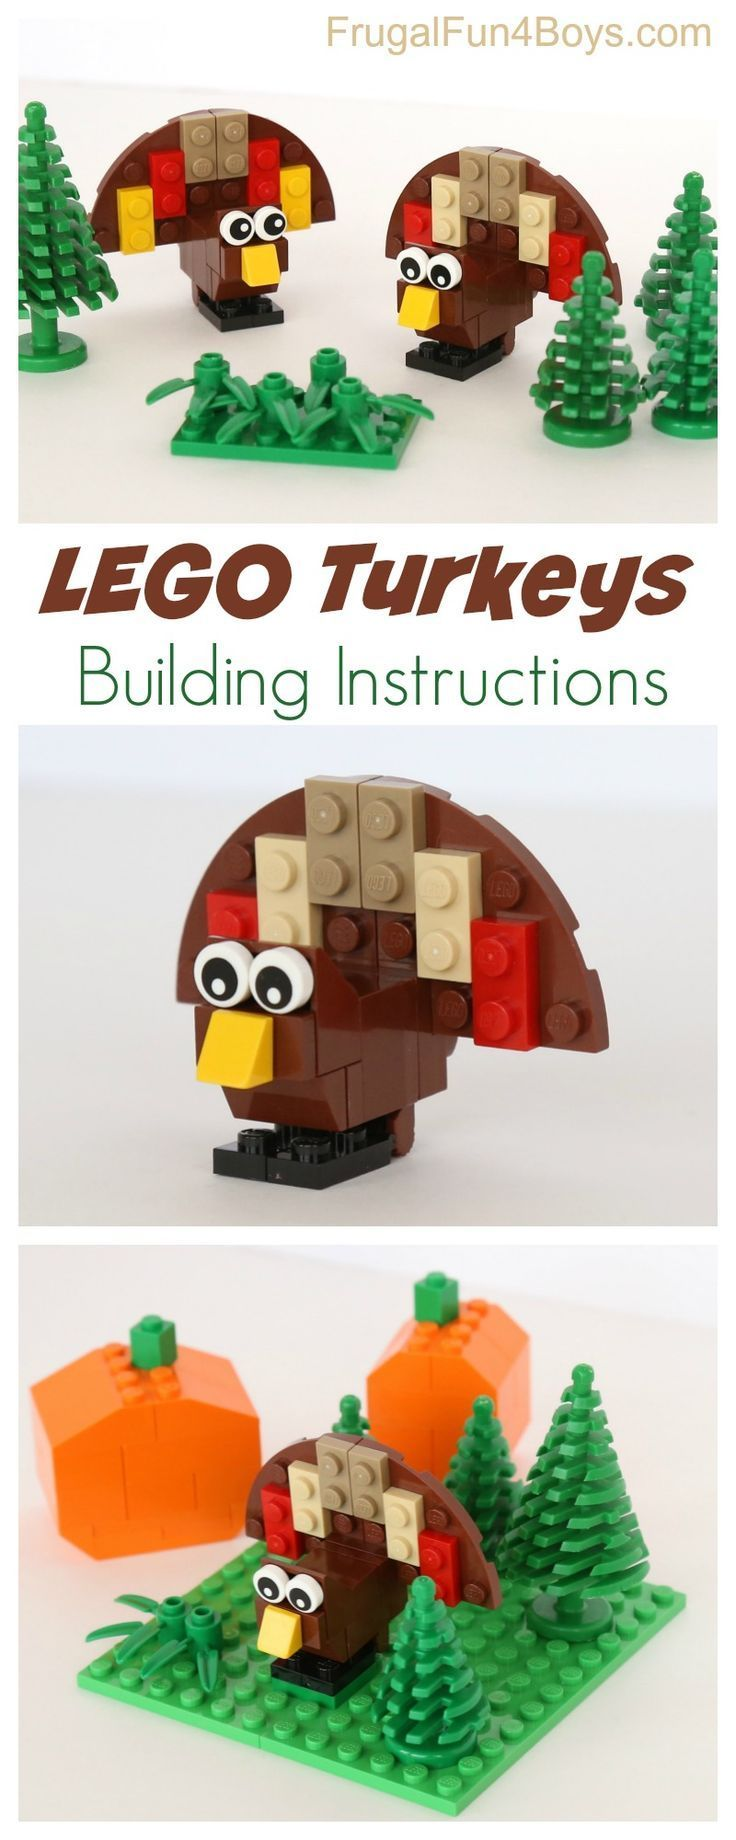 Thanksgiving turkey 40273 lego merchandise building.